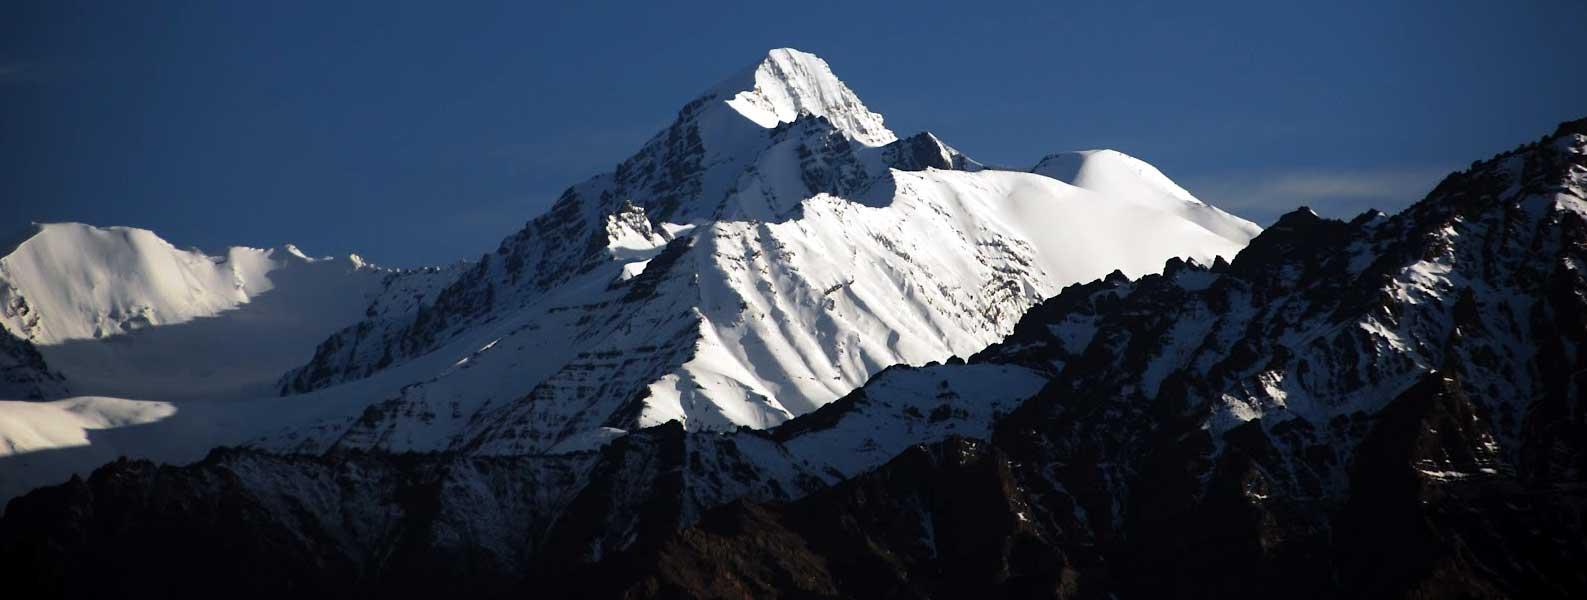 Stok Kangri Peak Expedition